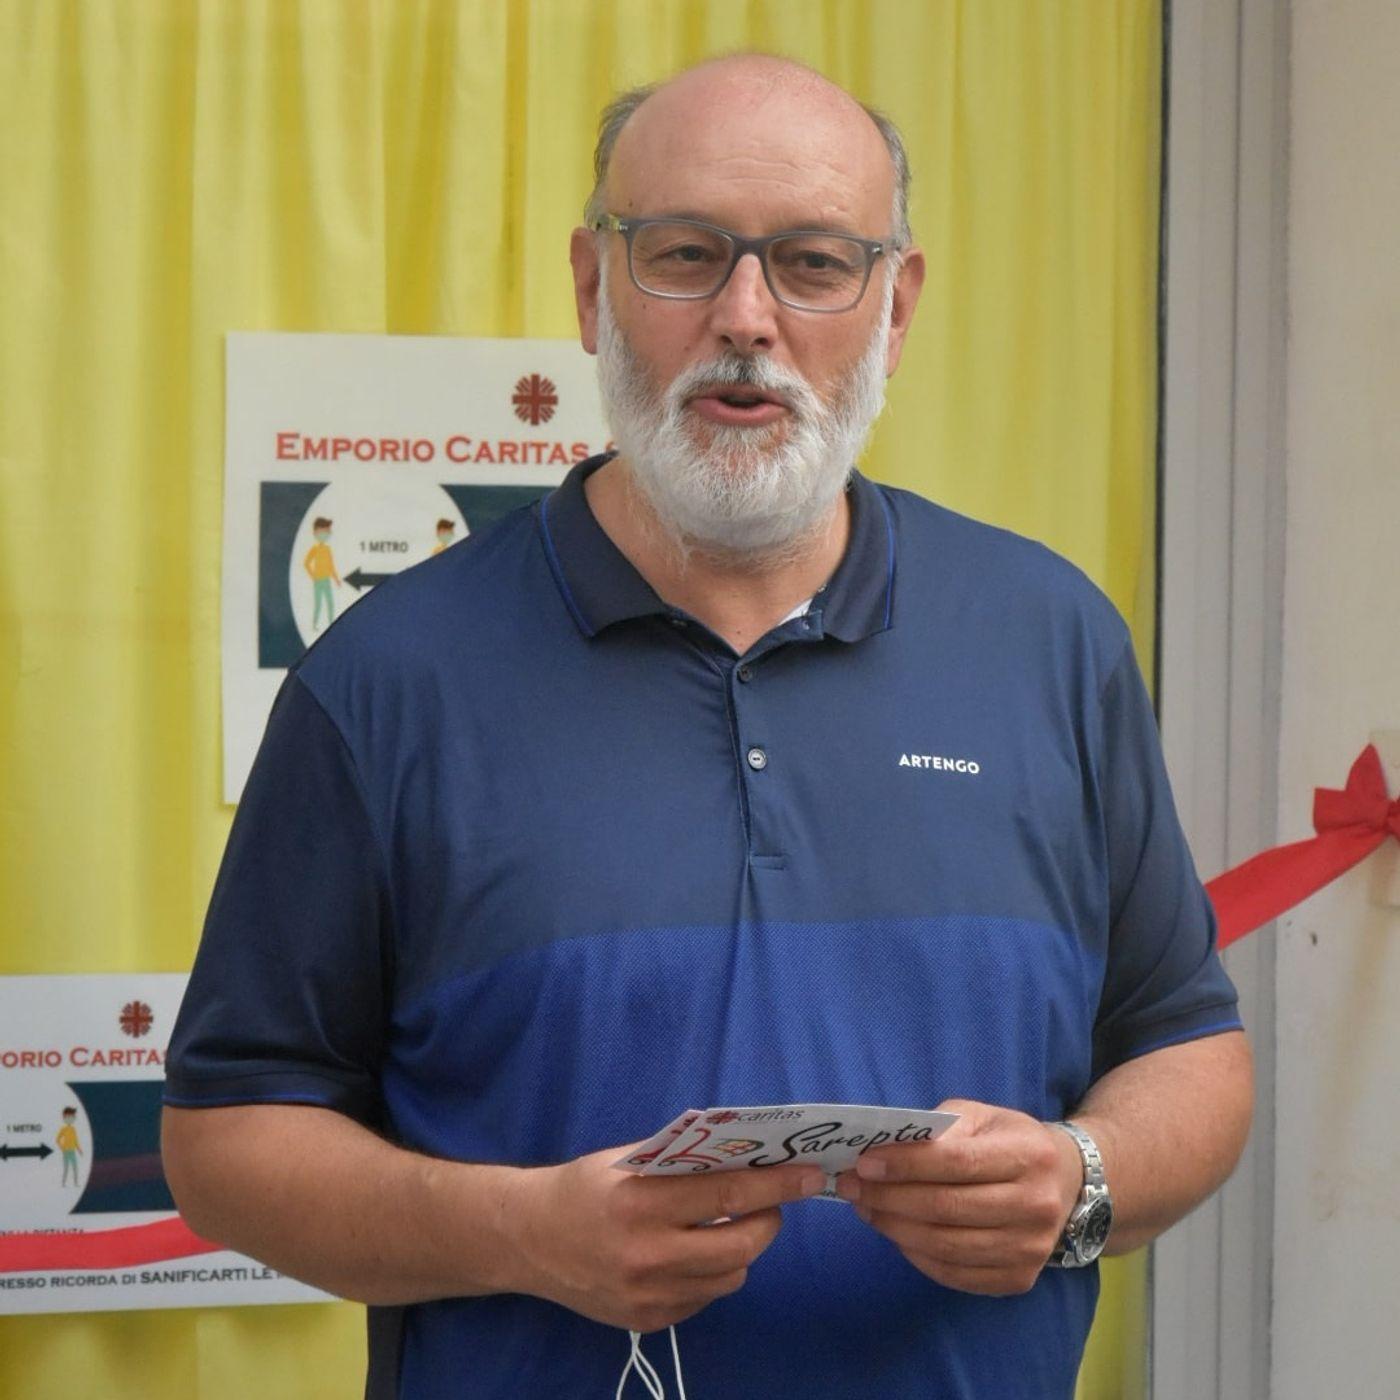 Emporio Caritas a Formia - Le parole di Don Alfredo Micalusi